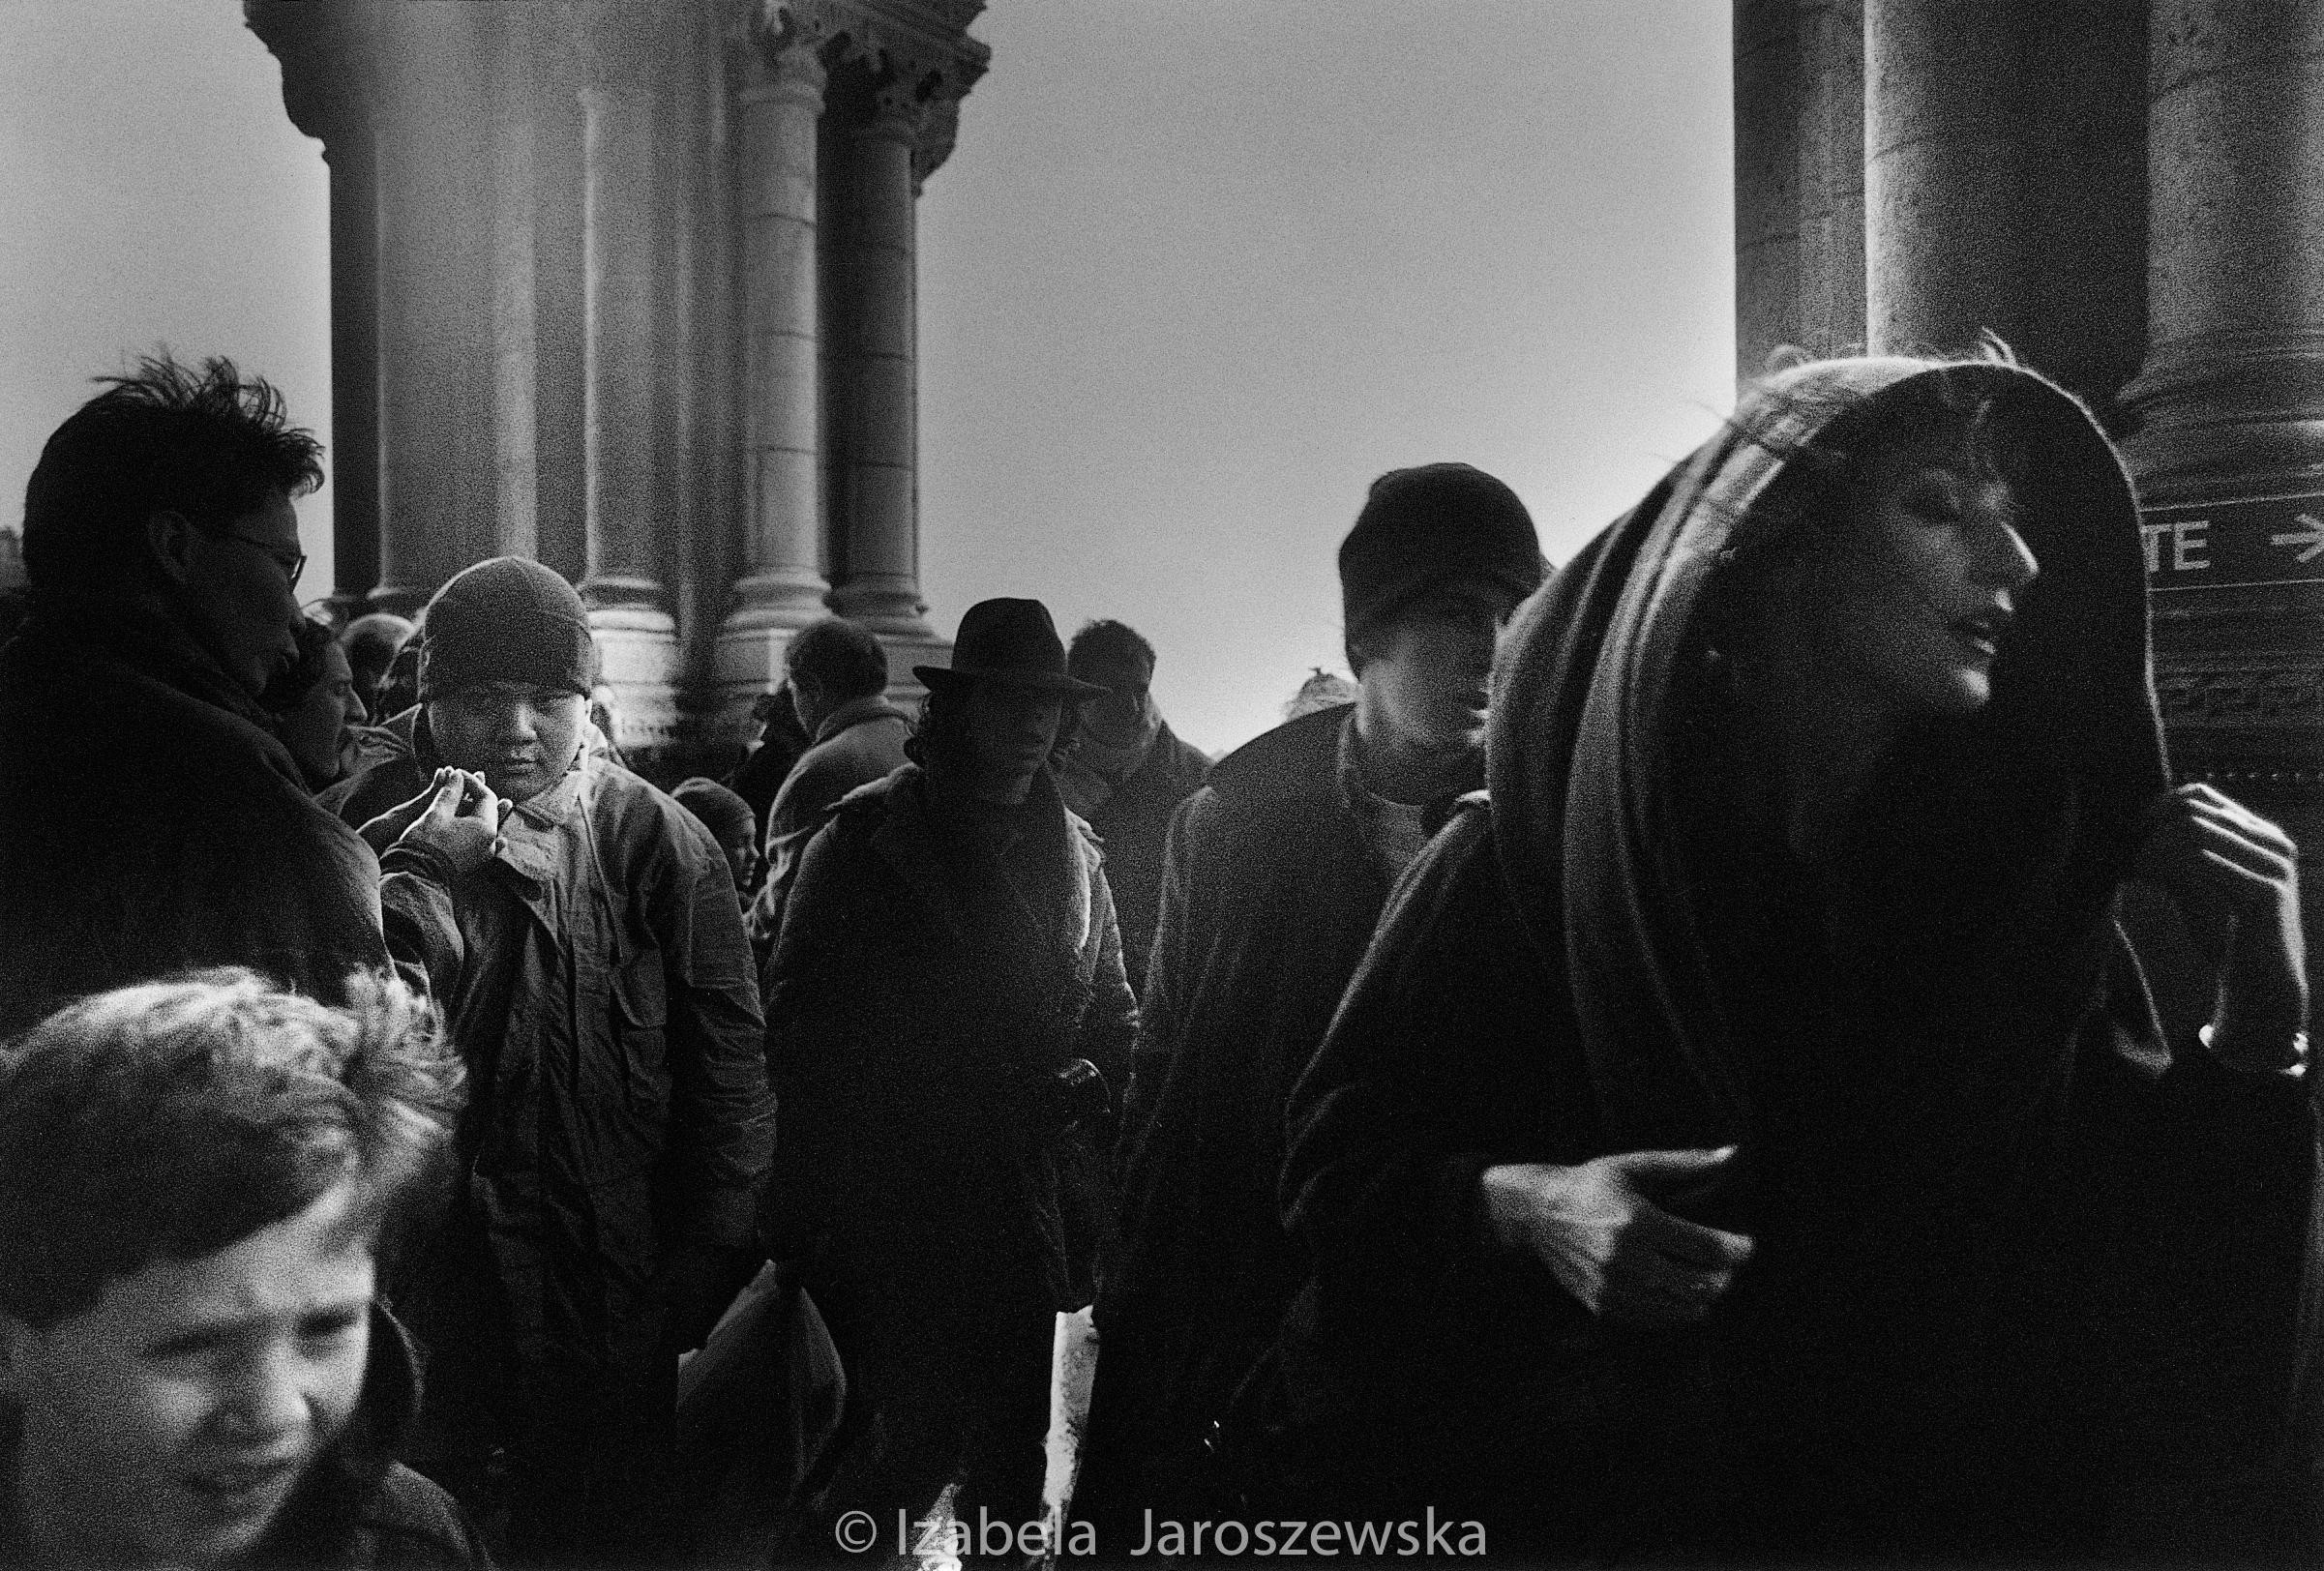 Paris ©Izabela Jaroszewska